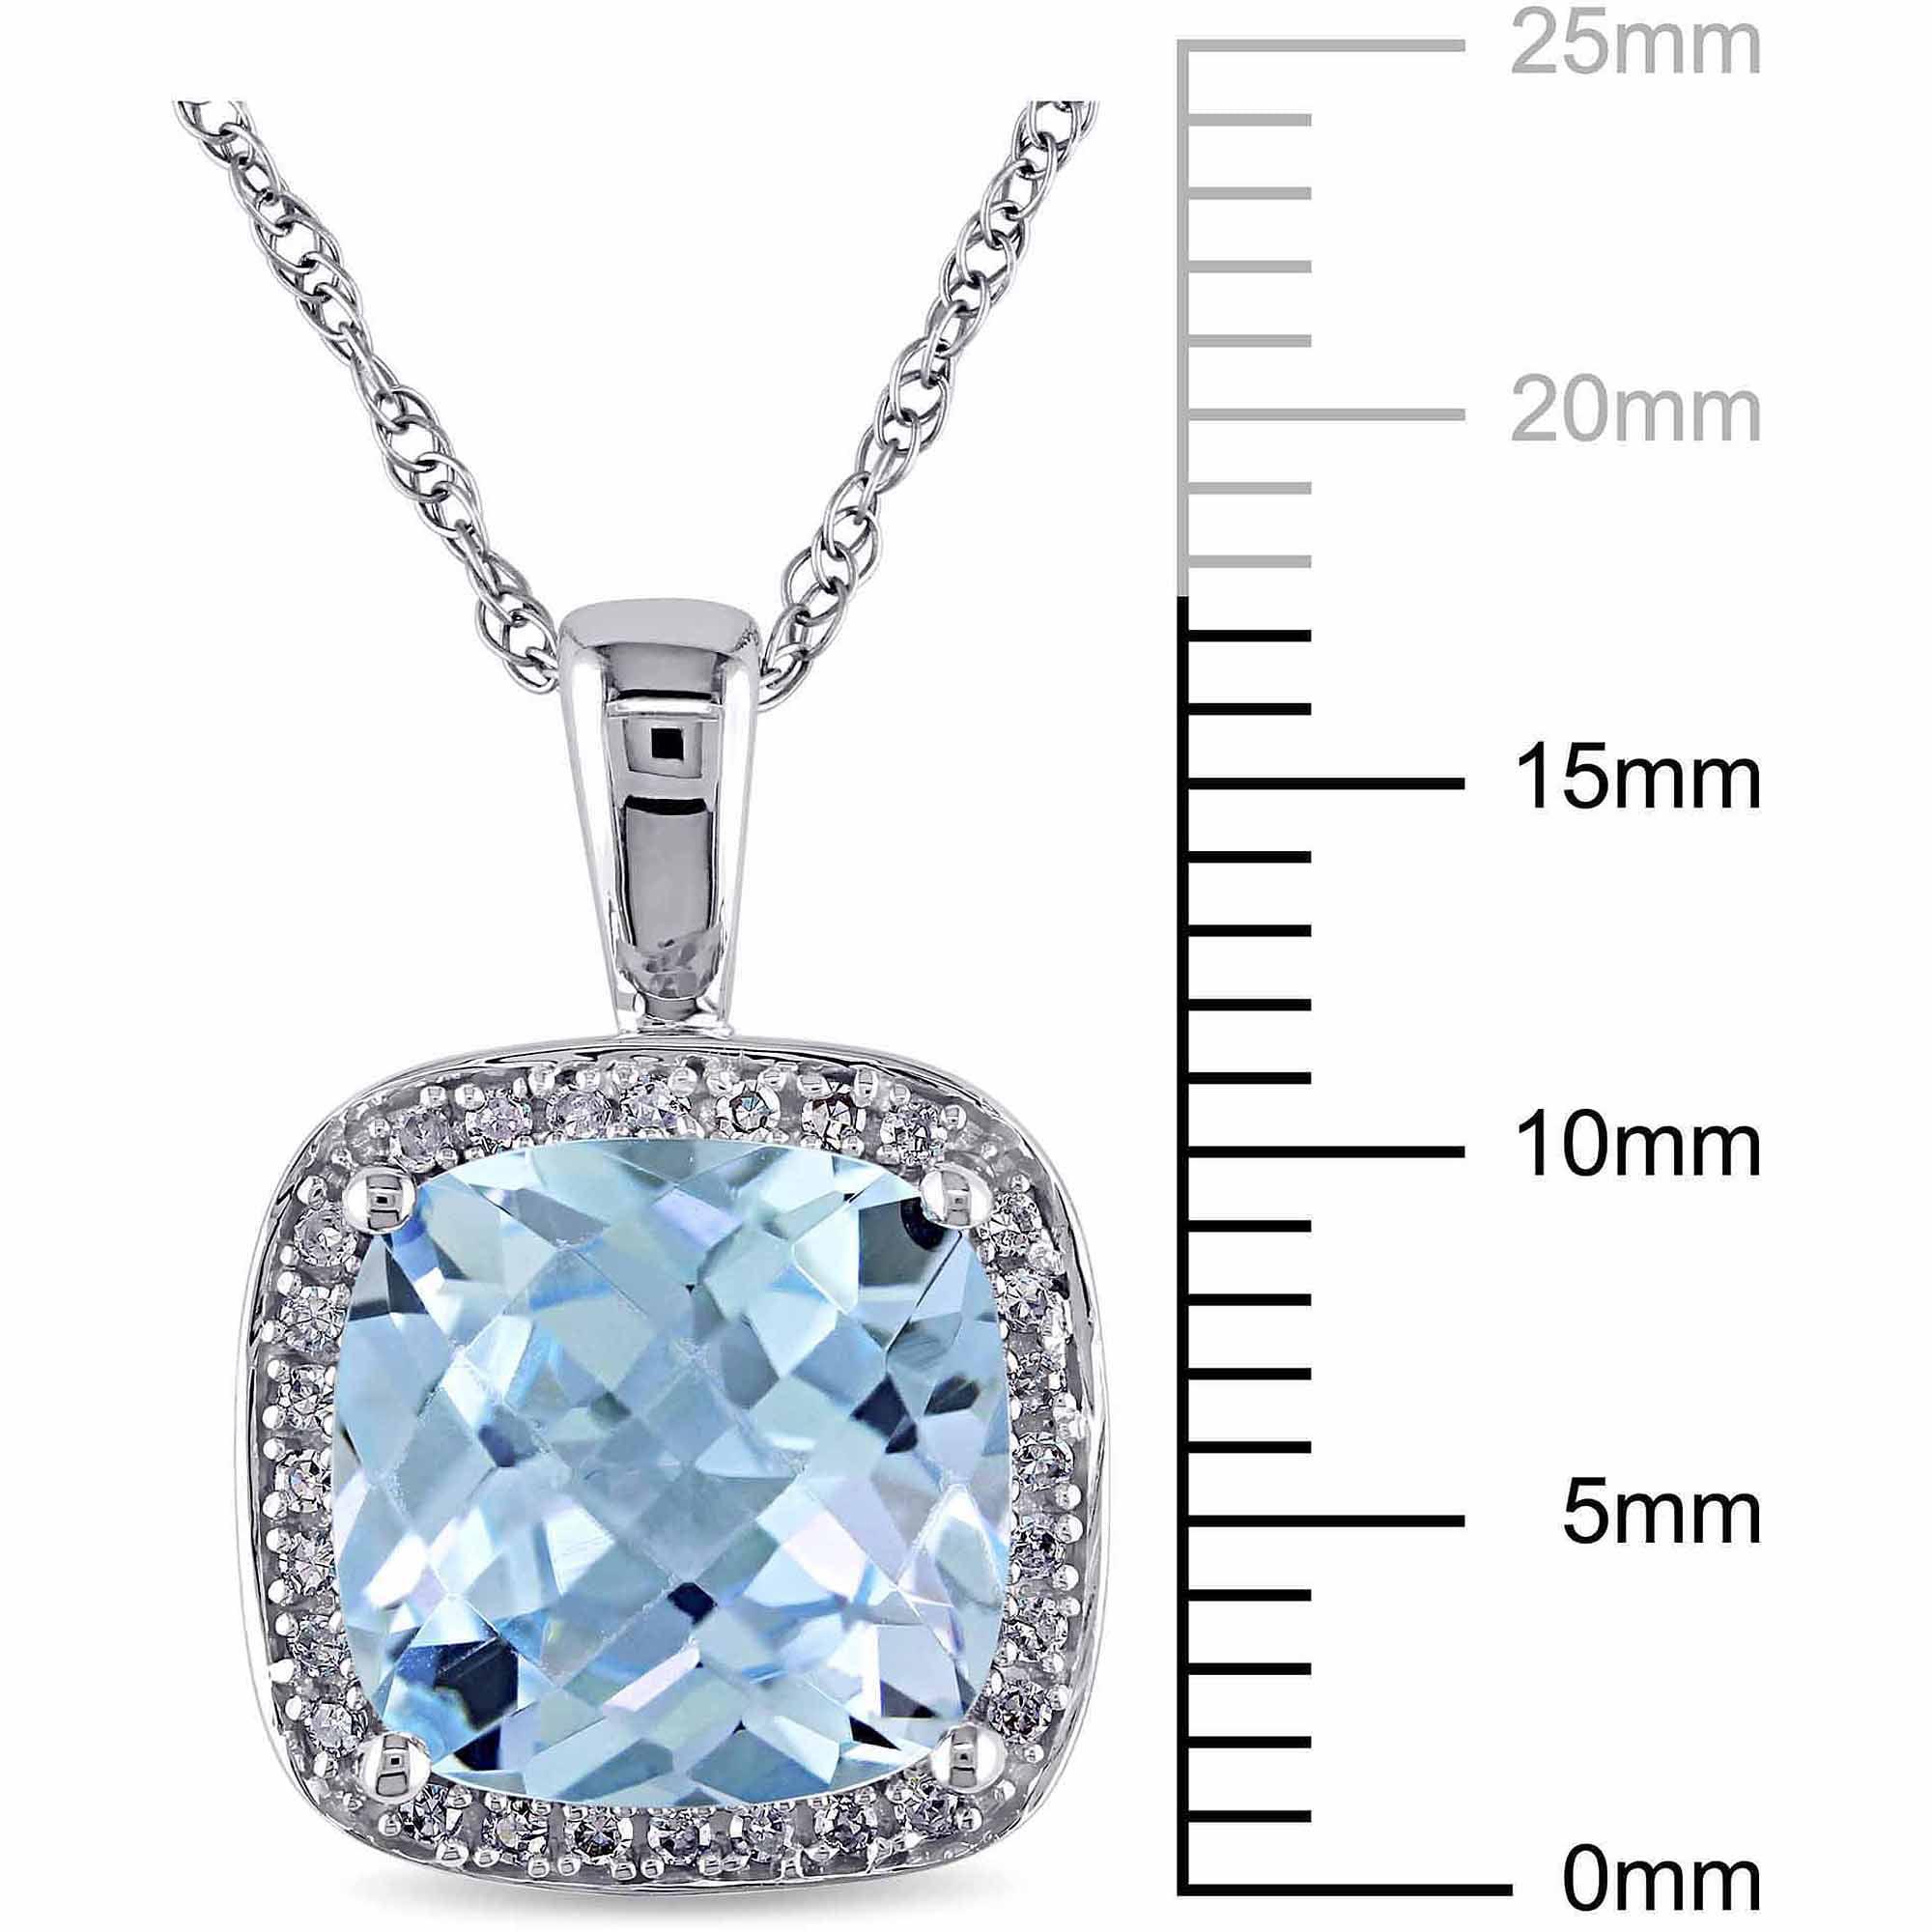 4-1/4 Carat T.G.W. Sky Blue Topaz and Diamond-Accent 10kt White Gold Halo Pendant, 17